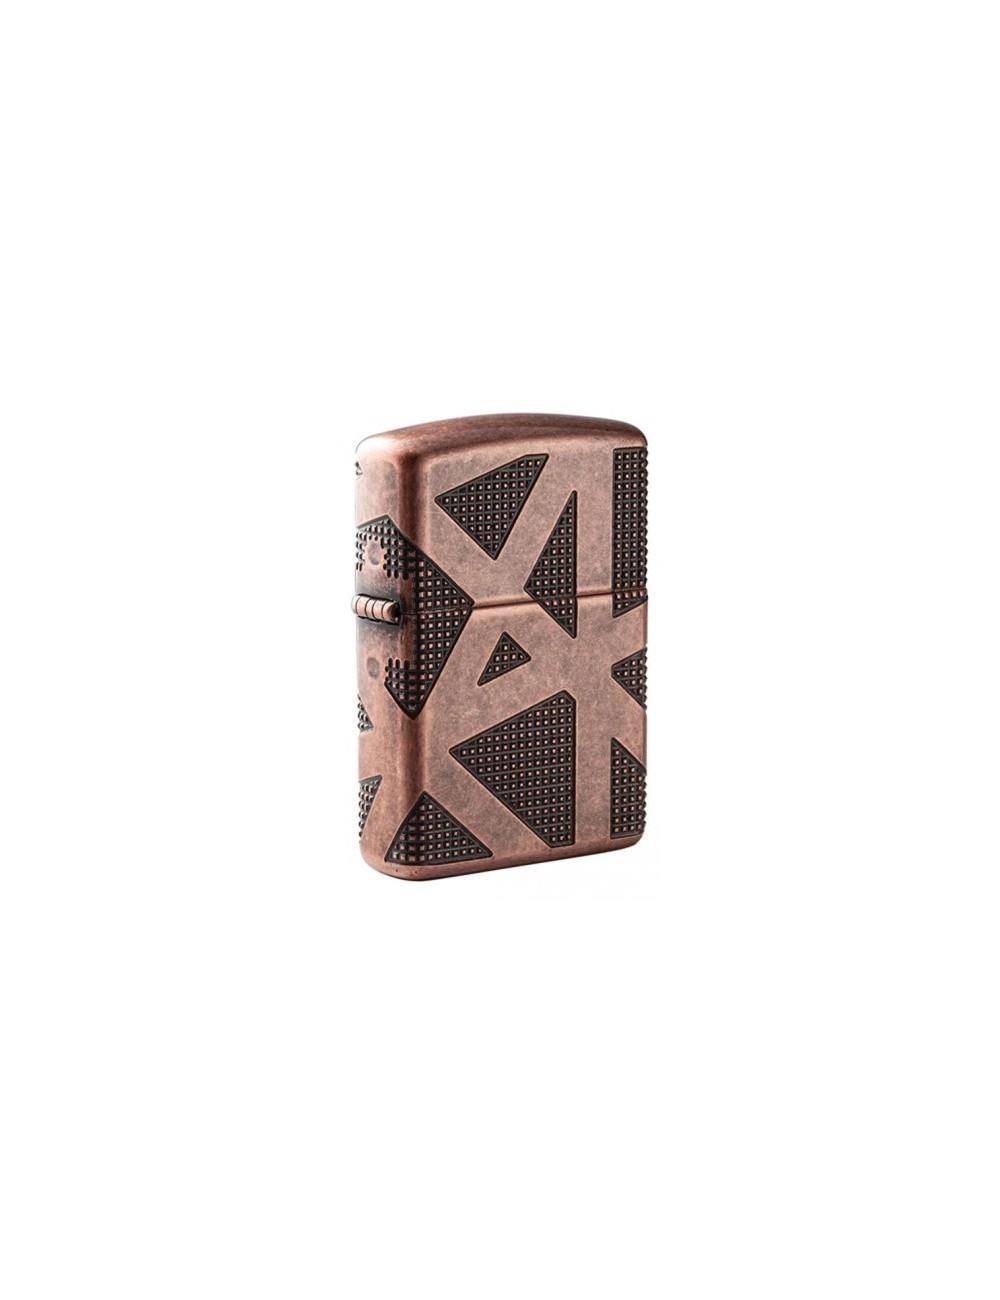 ZIPPO Αναπτήρας Armor® Geometric 360 Design 49036